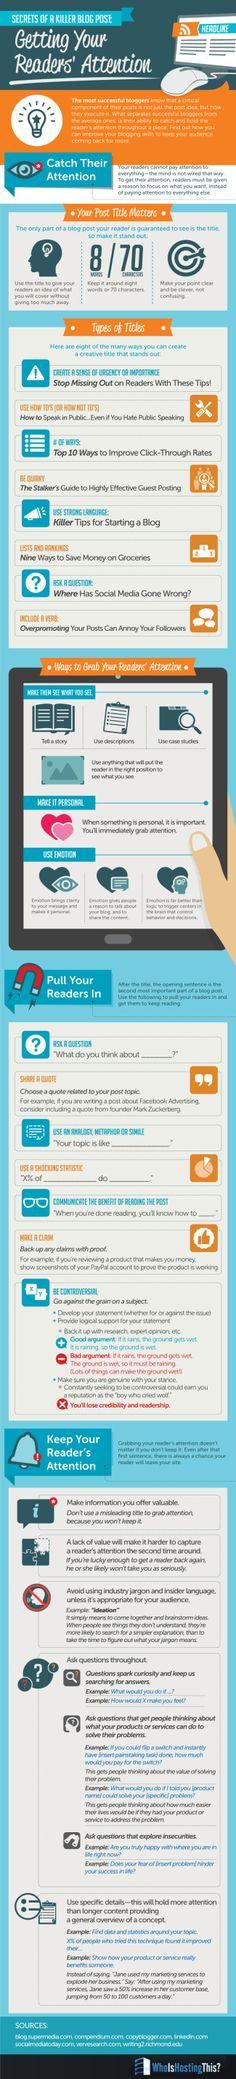 Secrets of a killer blog post (Infographic)